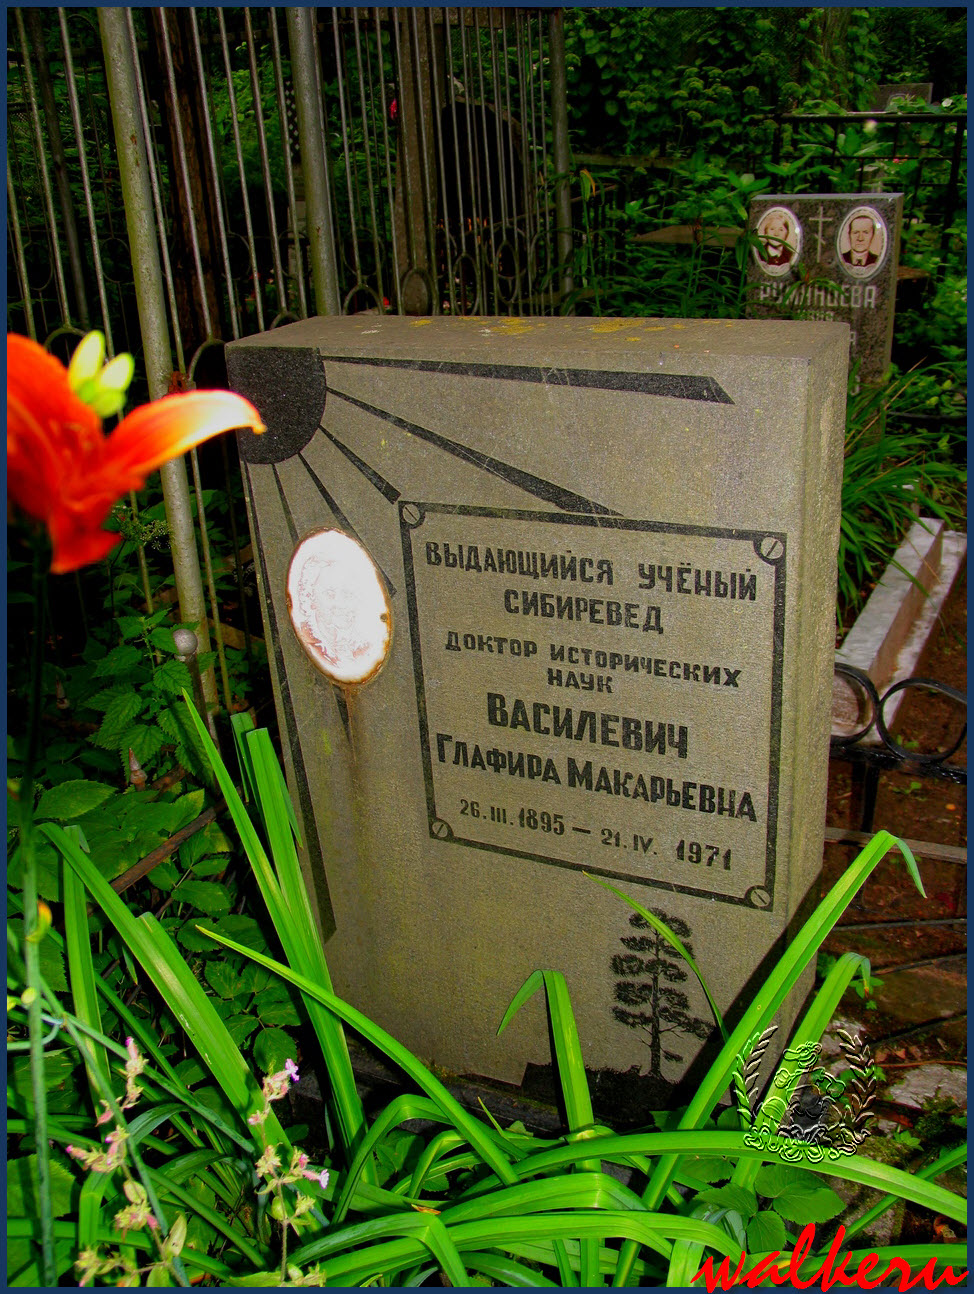 Могила Василевич Г.М. на Большеохтинском кладбище